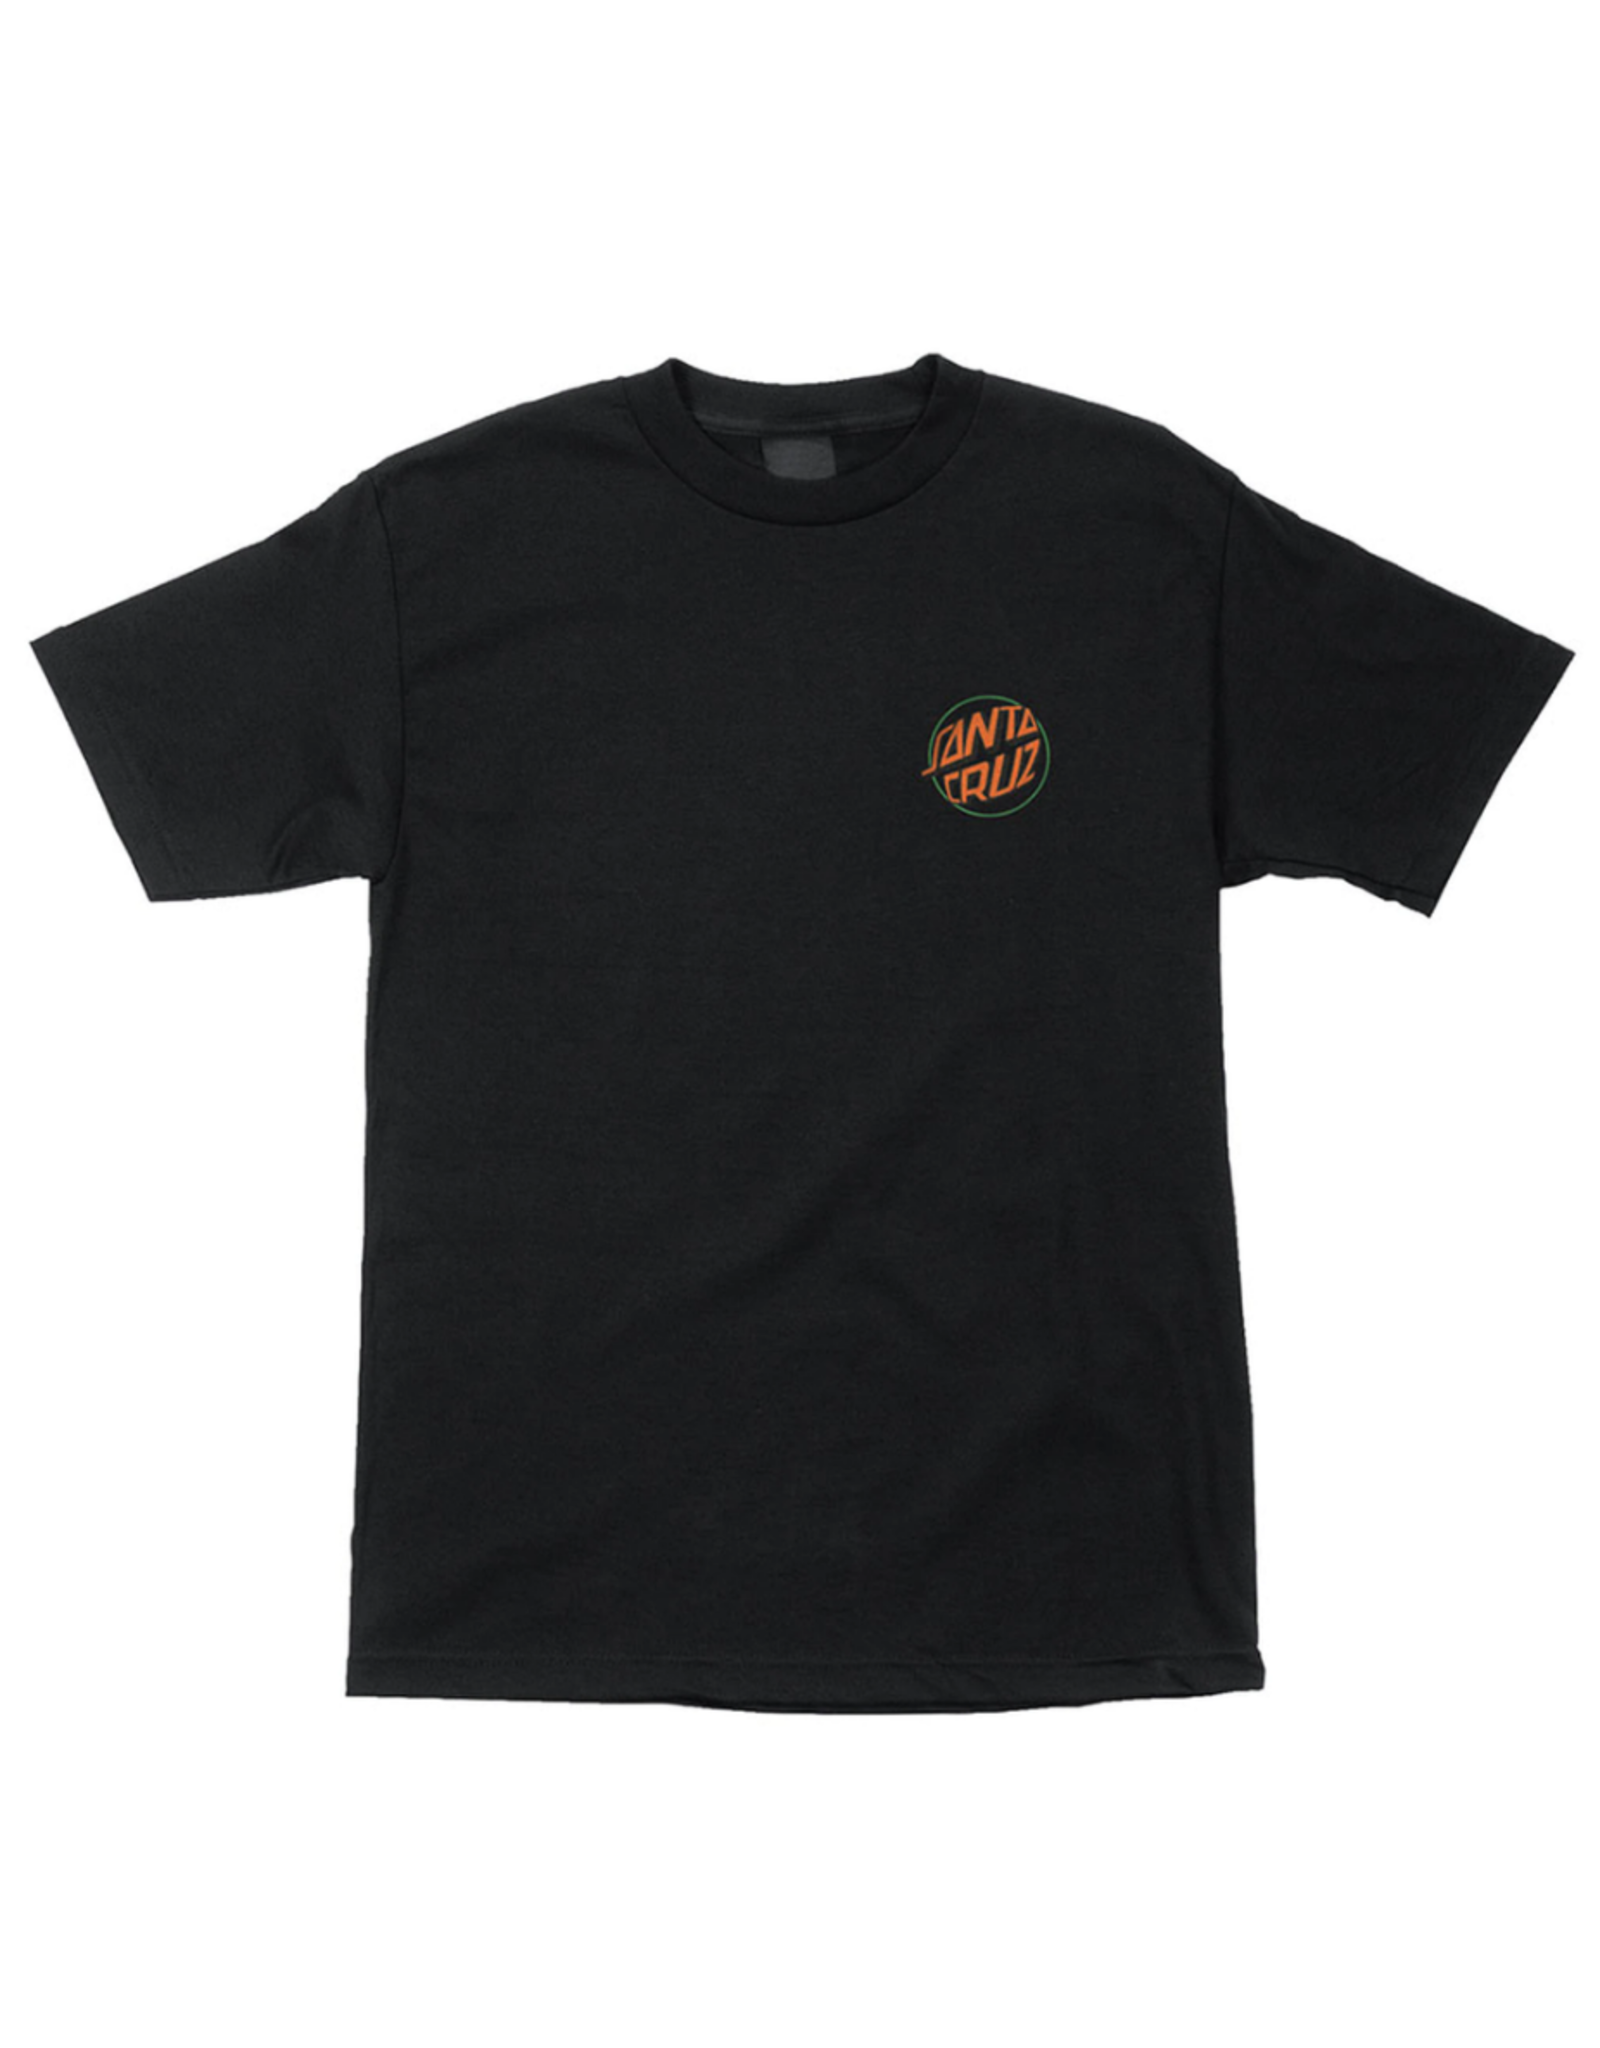 Santa Cruz Youth Toxic Hand T-Shirt - Black